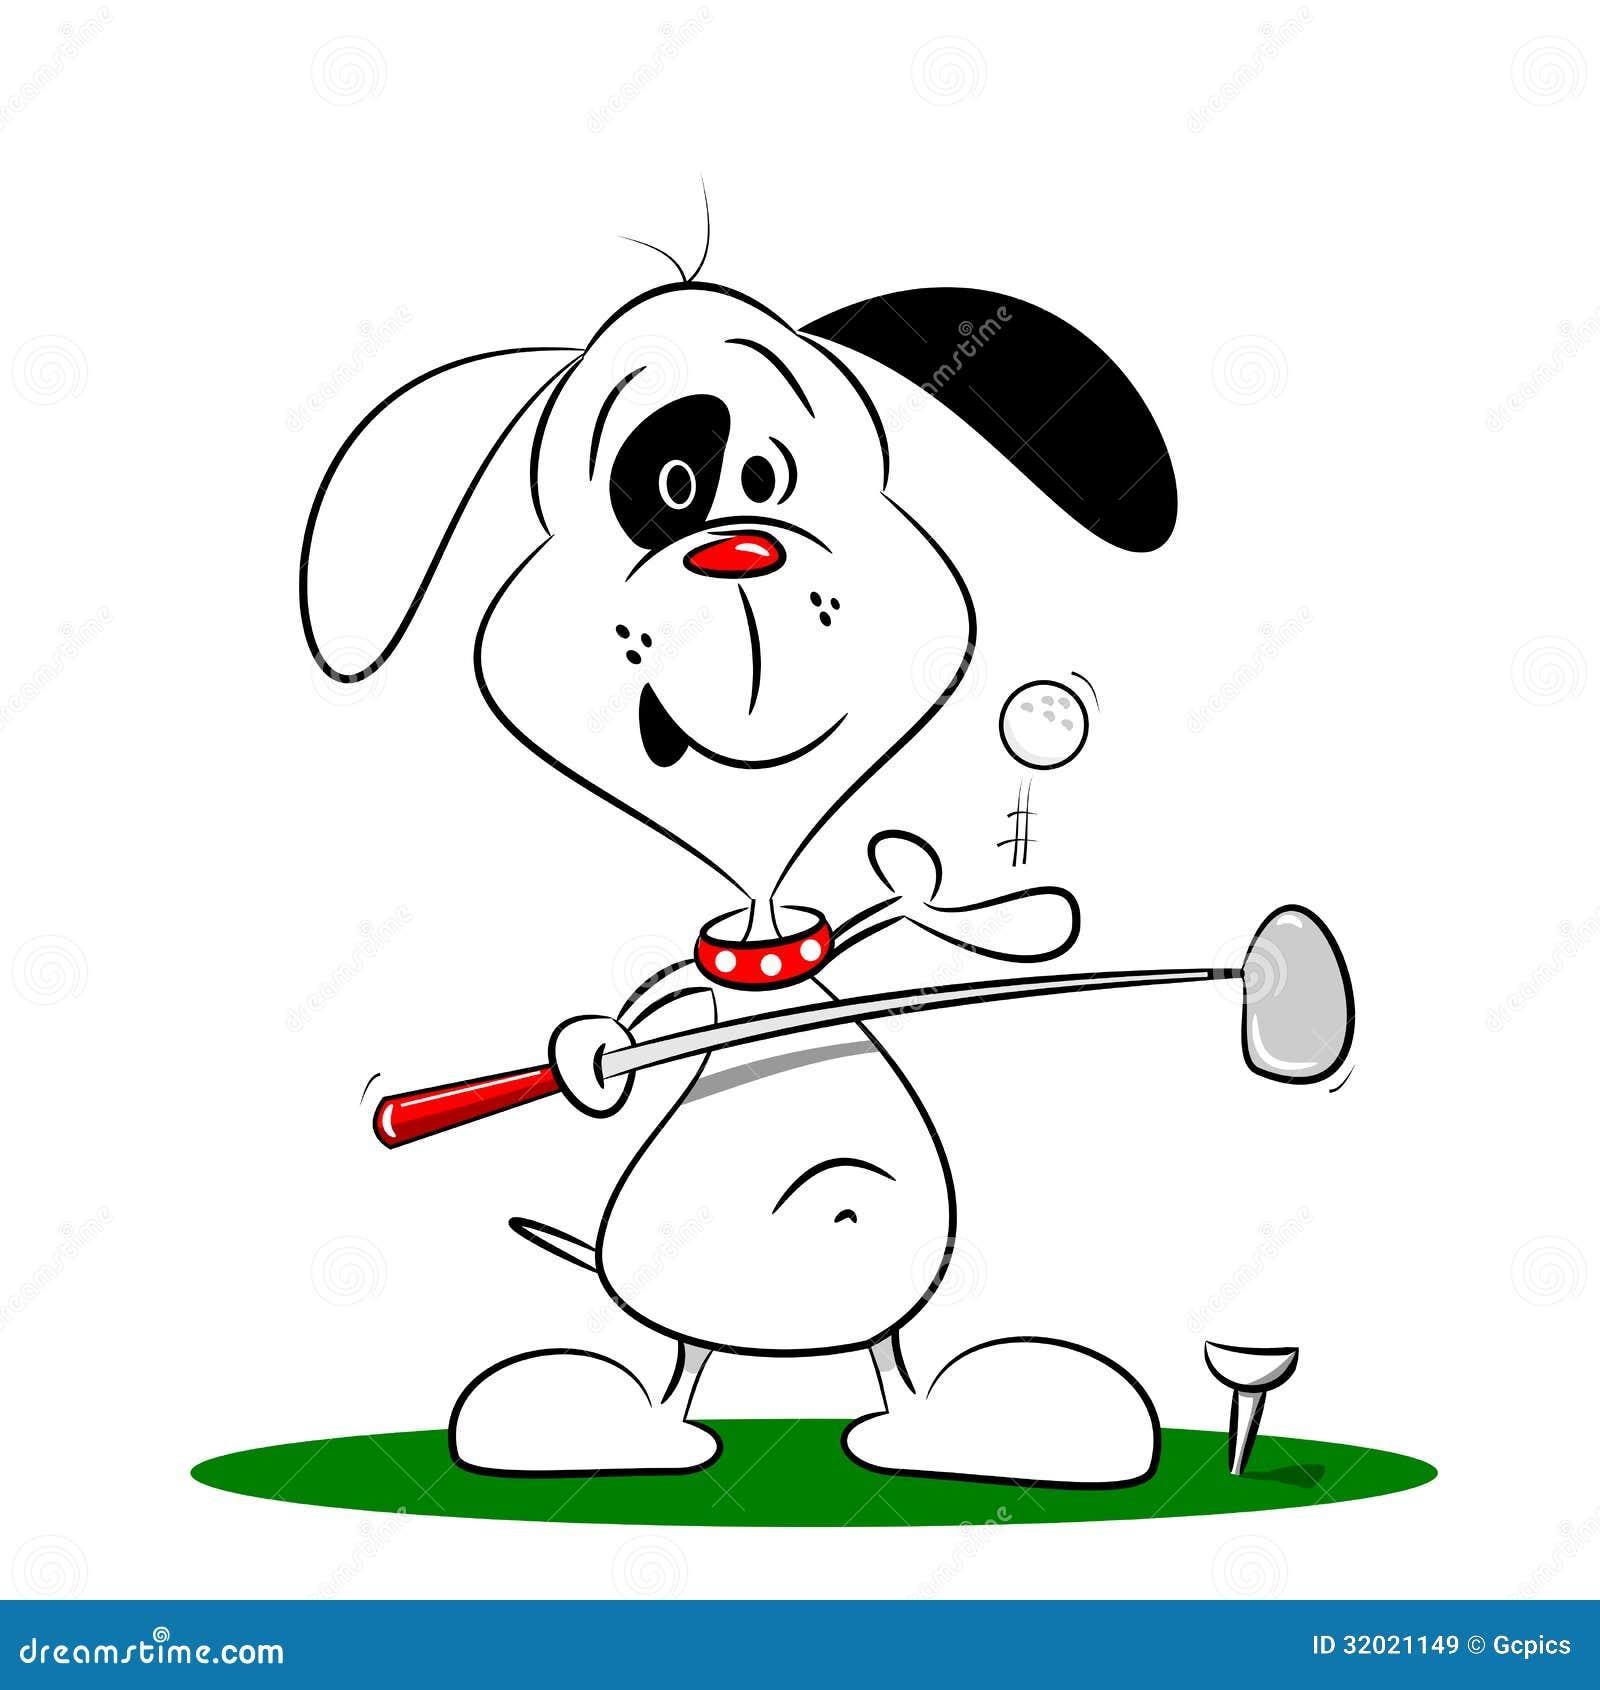 A cartoon dog playing golf stock vector. Illustration of ... on medical dog cartoon, fashion dog cartoon, scuba dog cartoon, bacon dog cartoon, flying dog cartoon, easter dog cartoon, shop dog cartoon, flyball dog cartoon, valentine's dog cartoon, bomb dog cartoon, winter dog cartoon, dancing dog cartoon, spider dog cartoon, disco dog cartoon, peace sign dog cartoon, sea dog cartoon, surf dog cartoon, multipurpose dog cartoon, 4th of july dog cartoon, dress up dog cartoon,